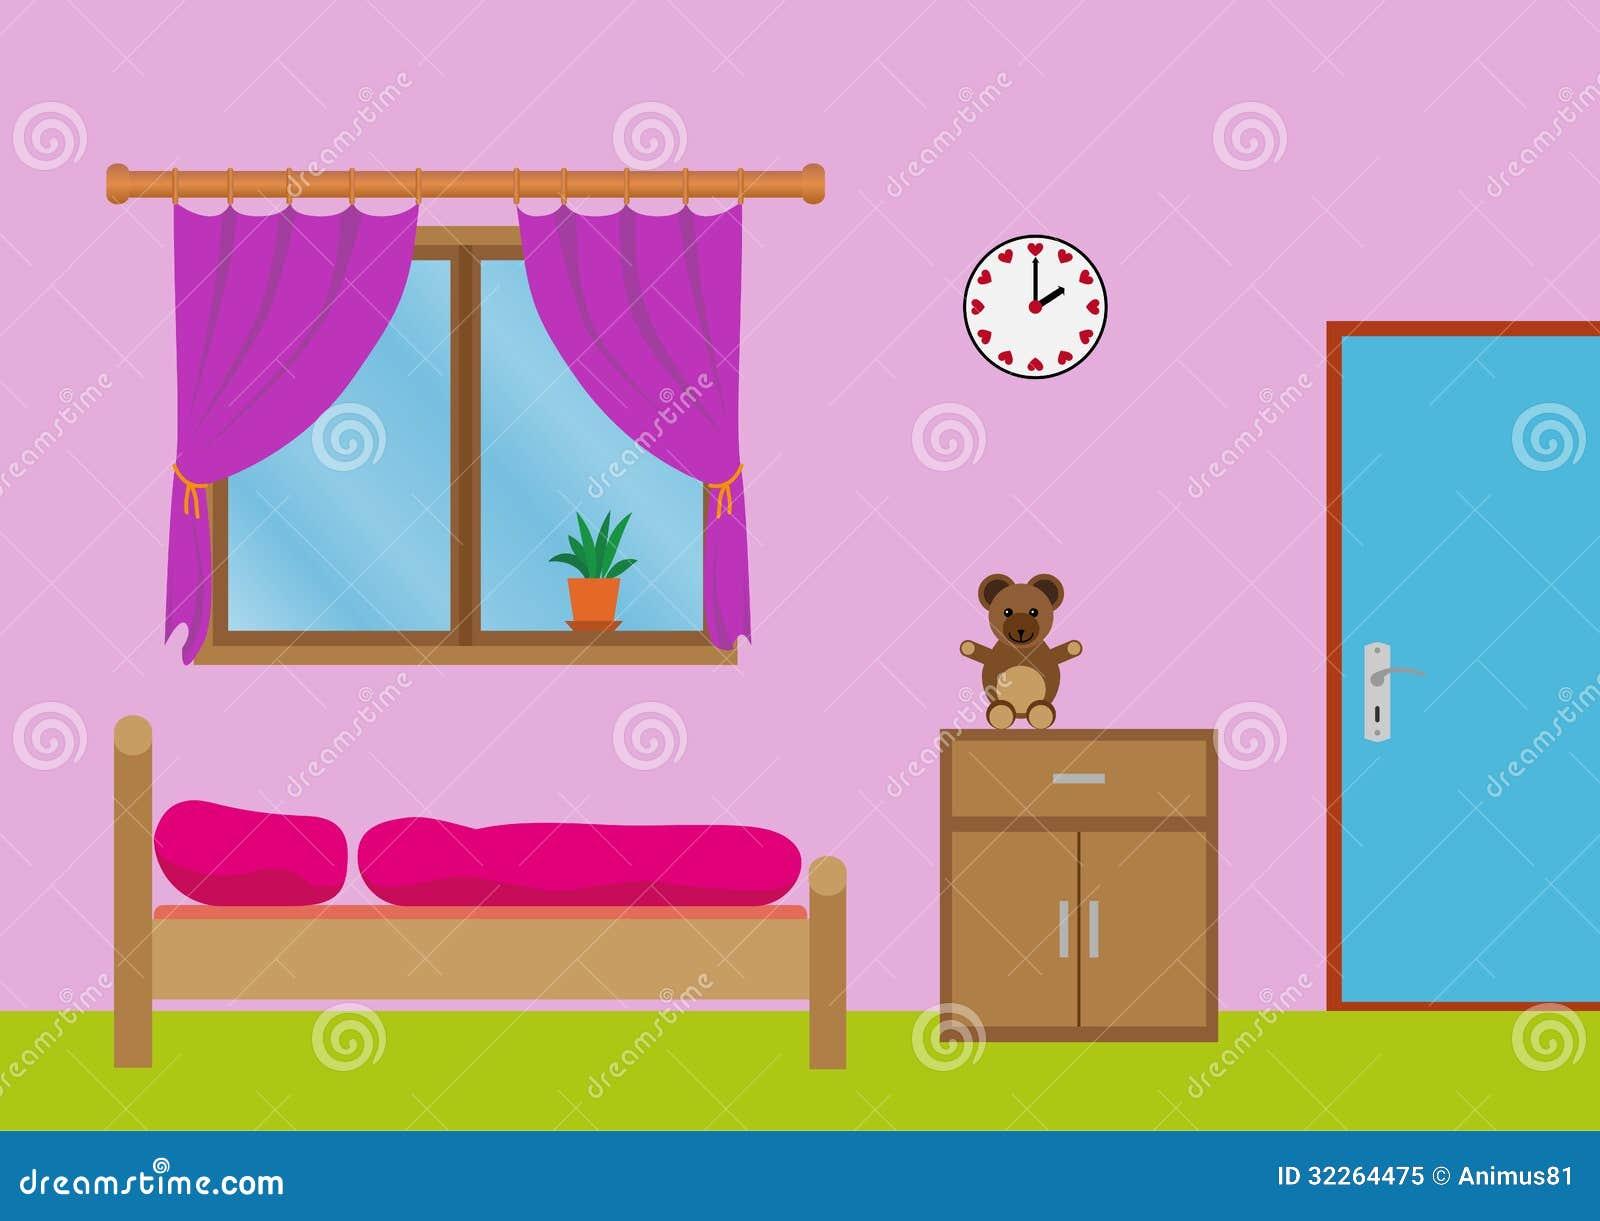 Girls Room Royalty Free Stock Photo - Image: 32264475